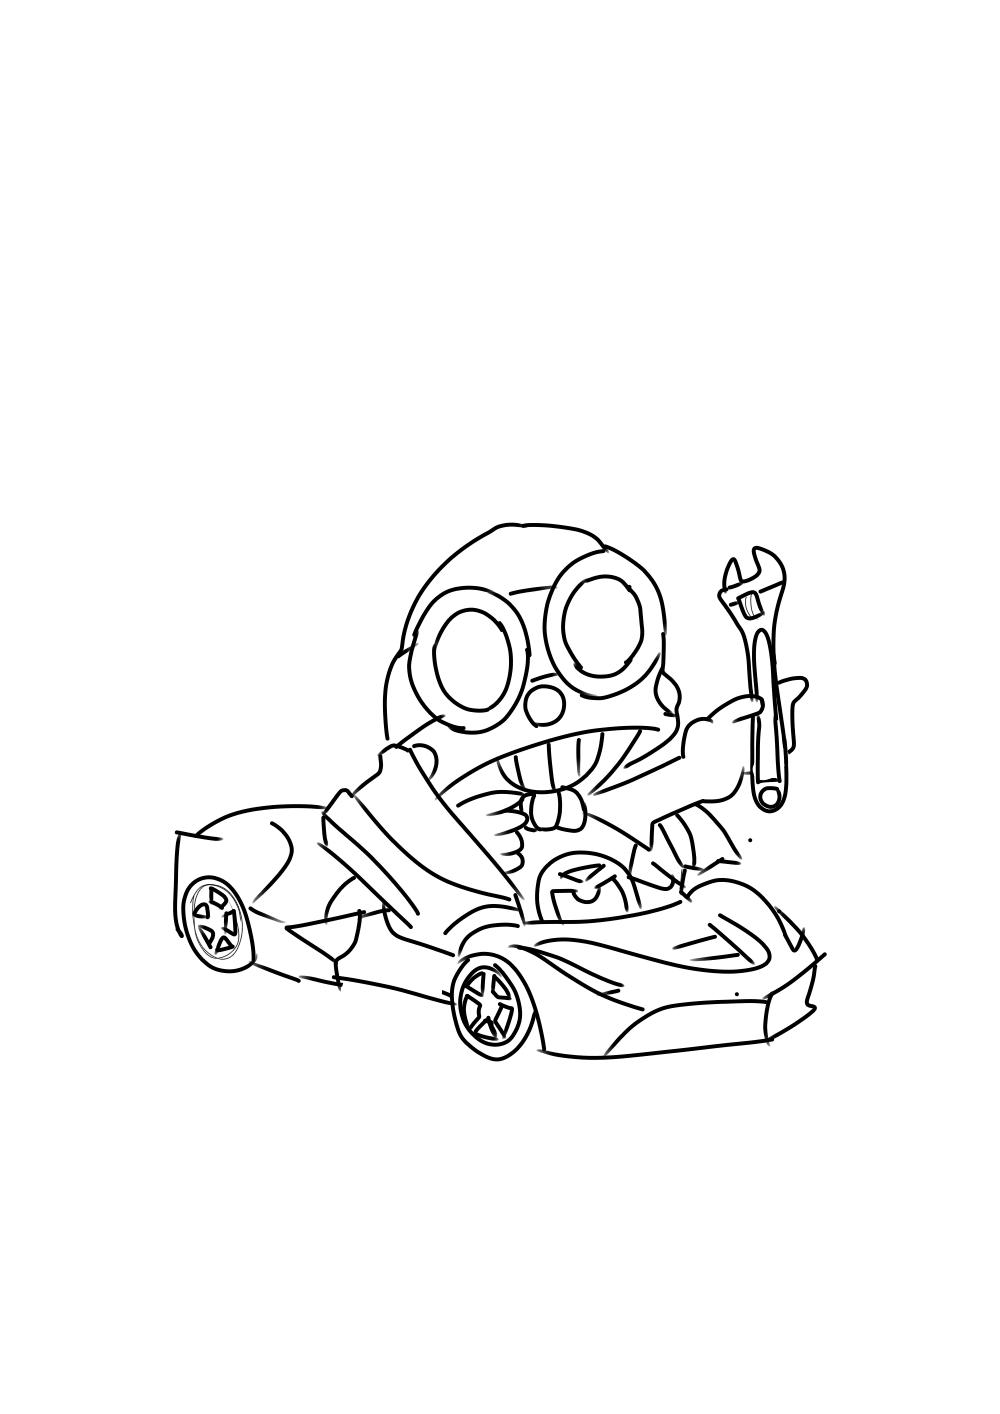 [Idea] Race Carl. sorry im bad at drawing : Brawlstars